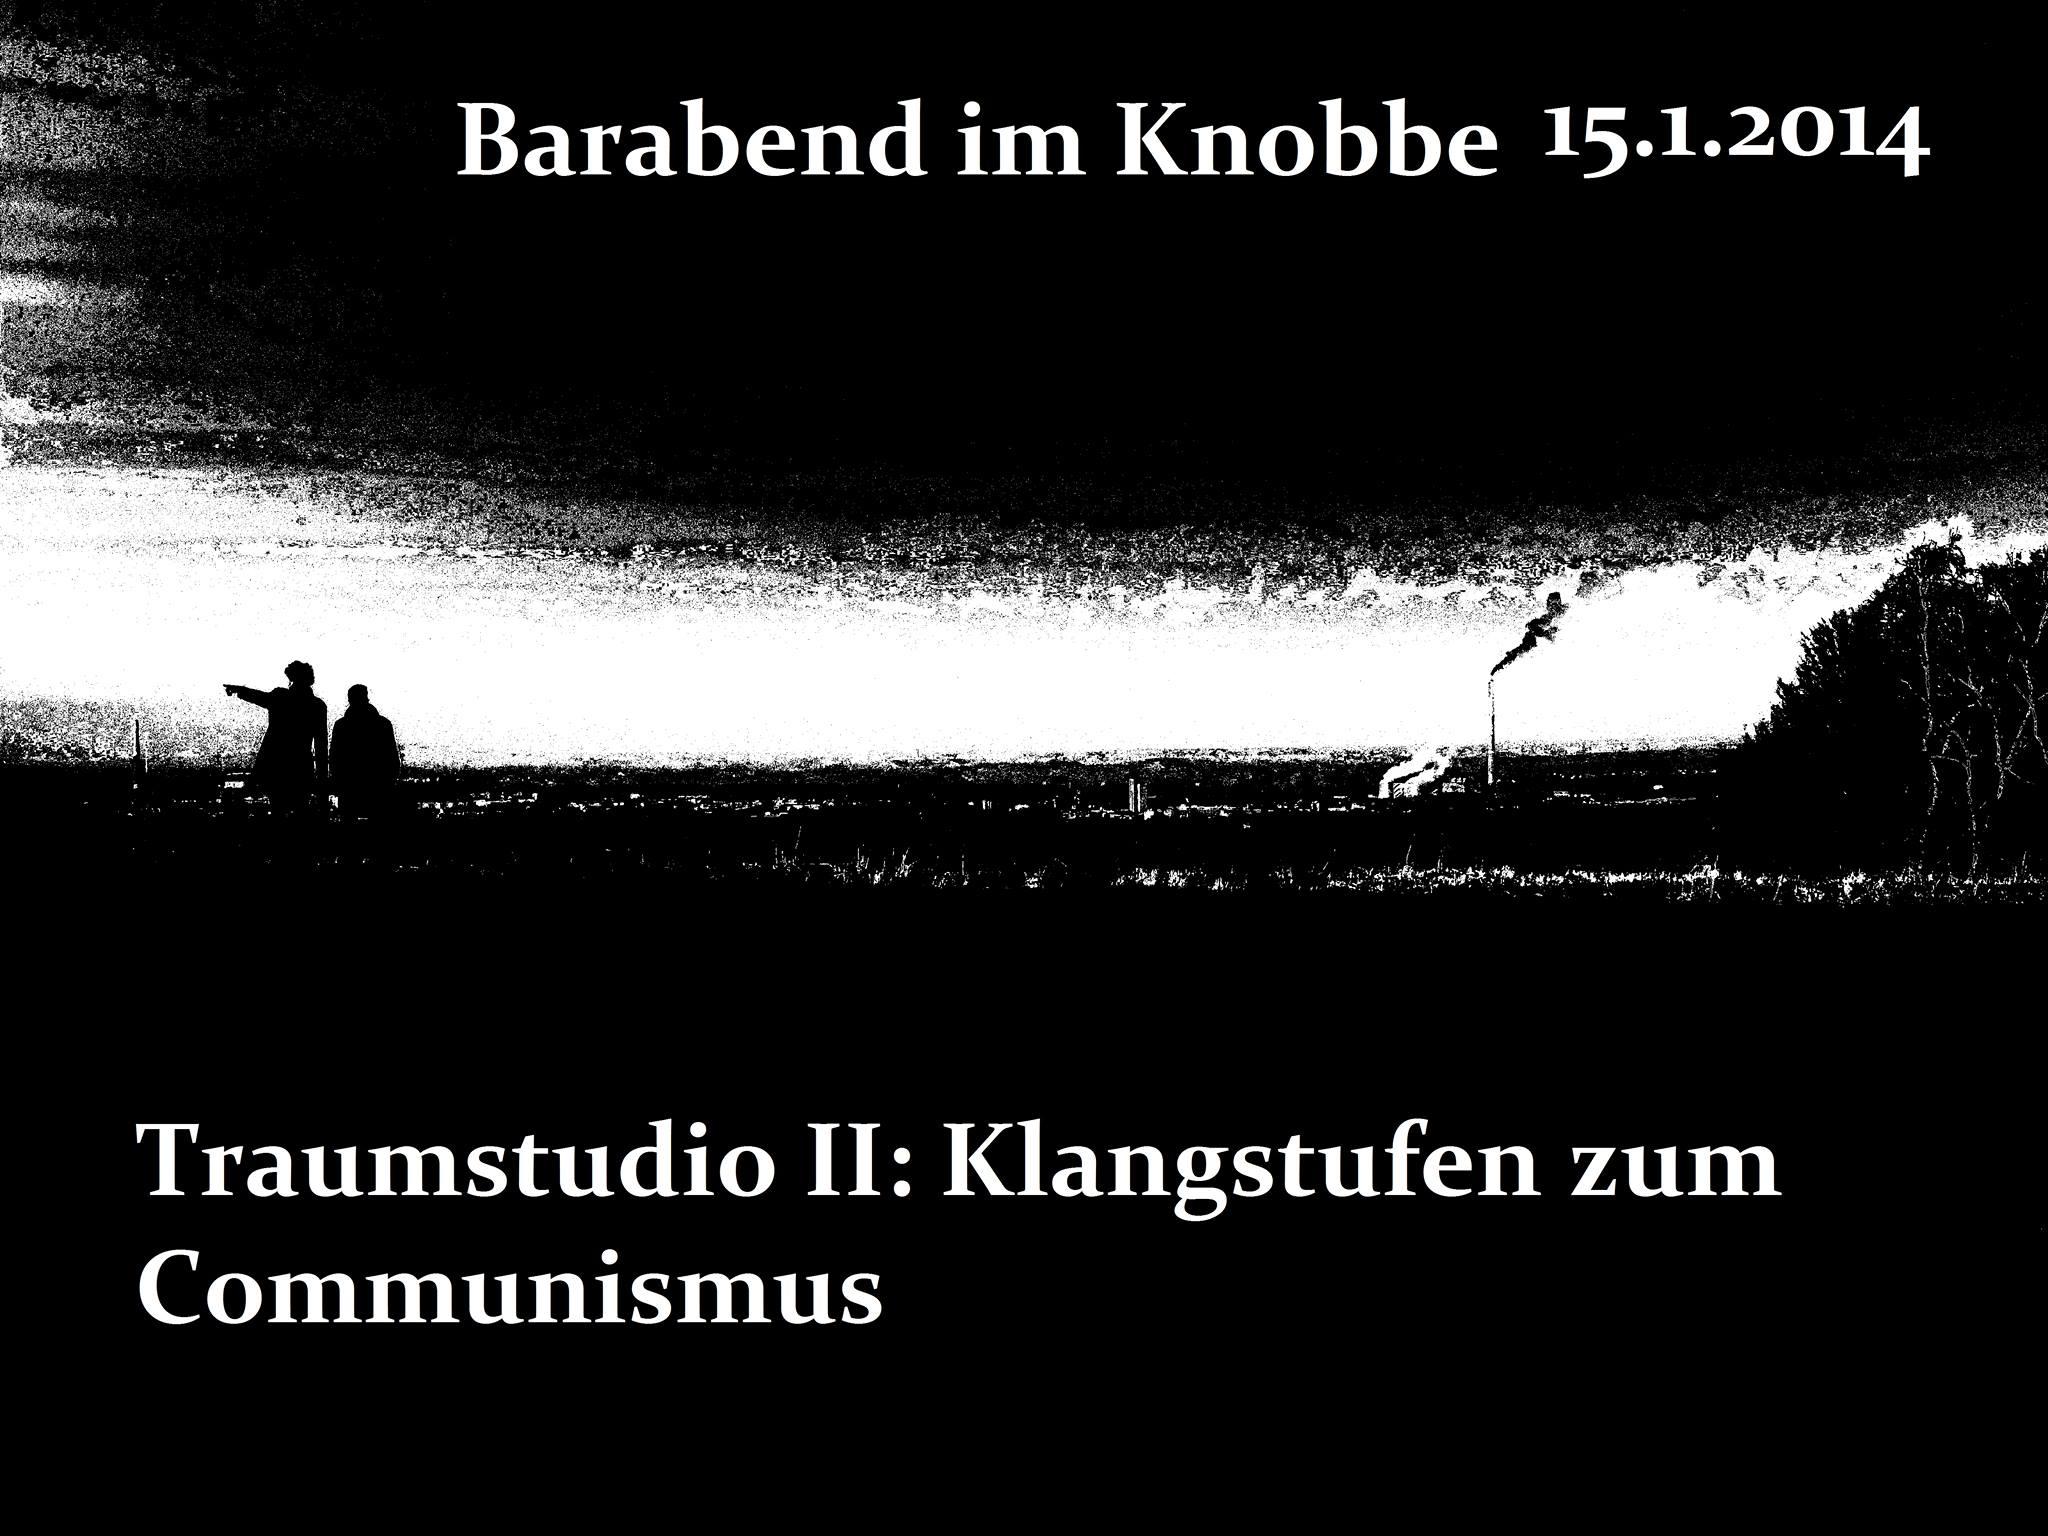 Barabend Traumstudio II